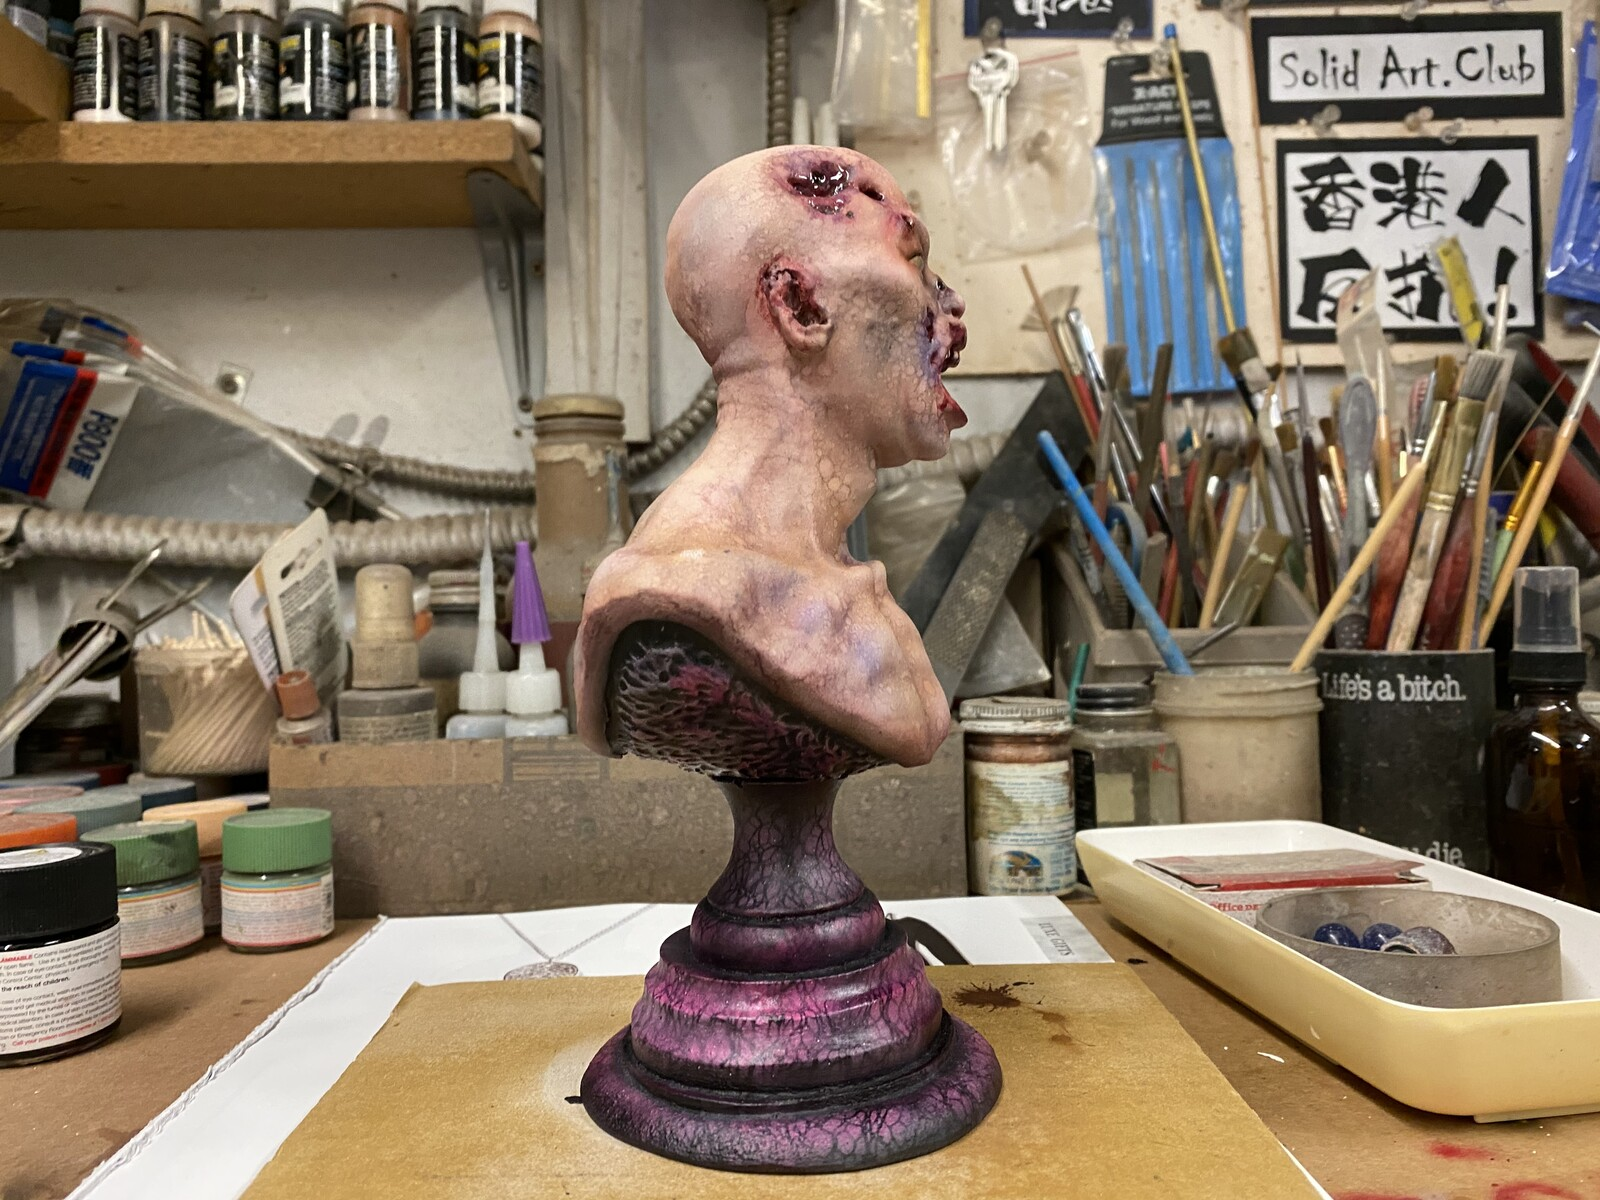 Zombie Bust 1:3 scale Art Statue  https://www.solidart.club/